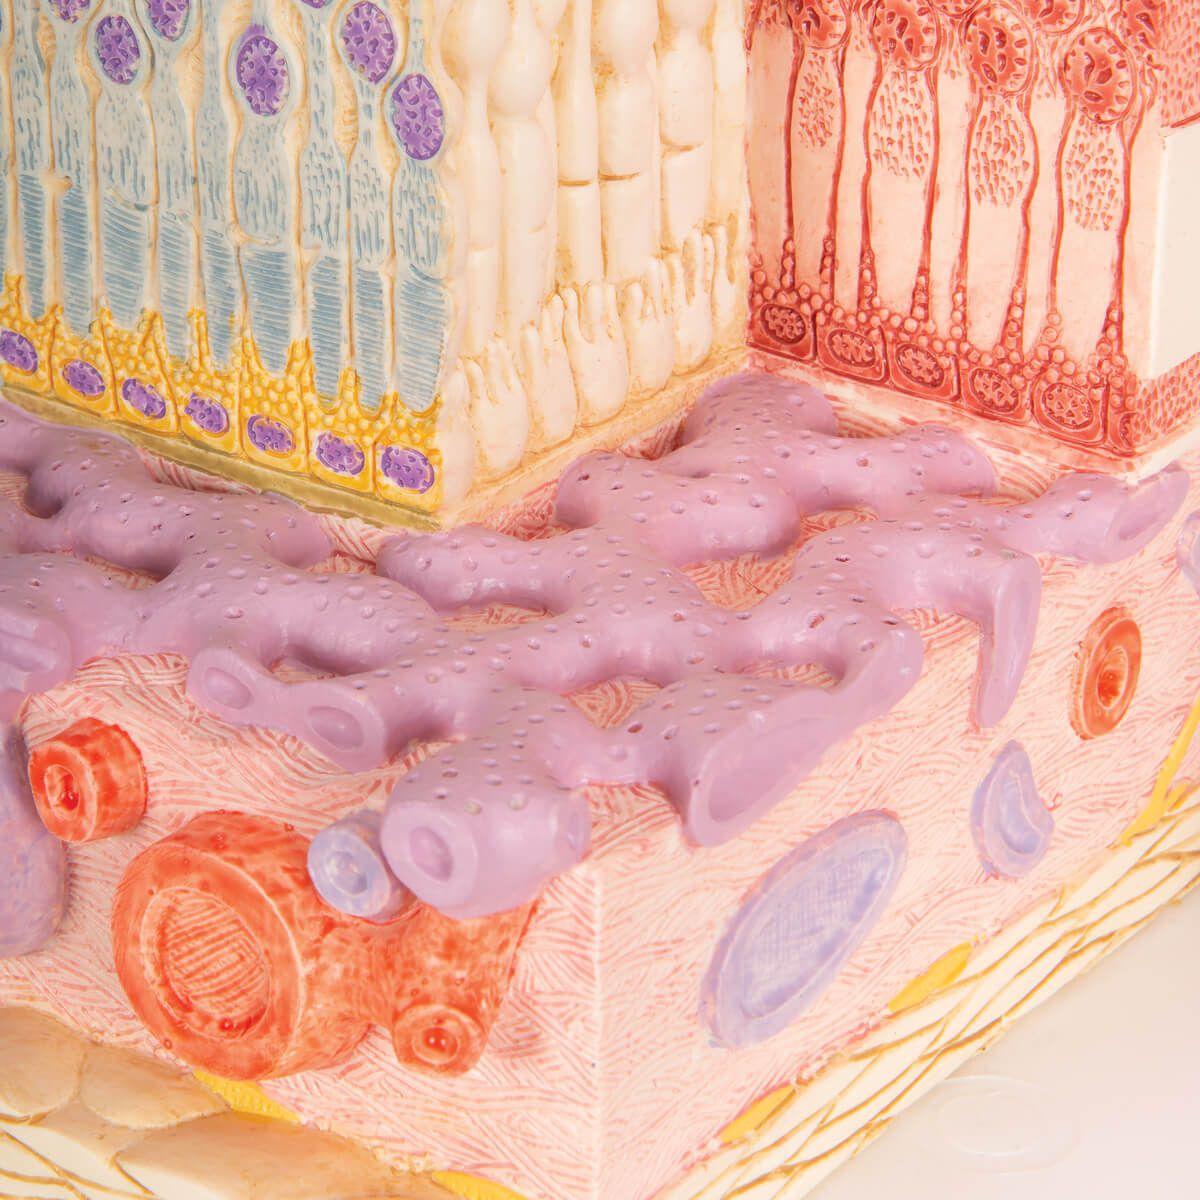 3b Microanatomy Olho